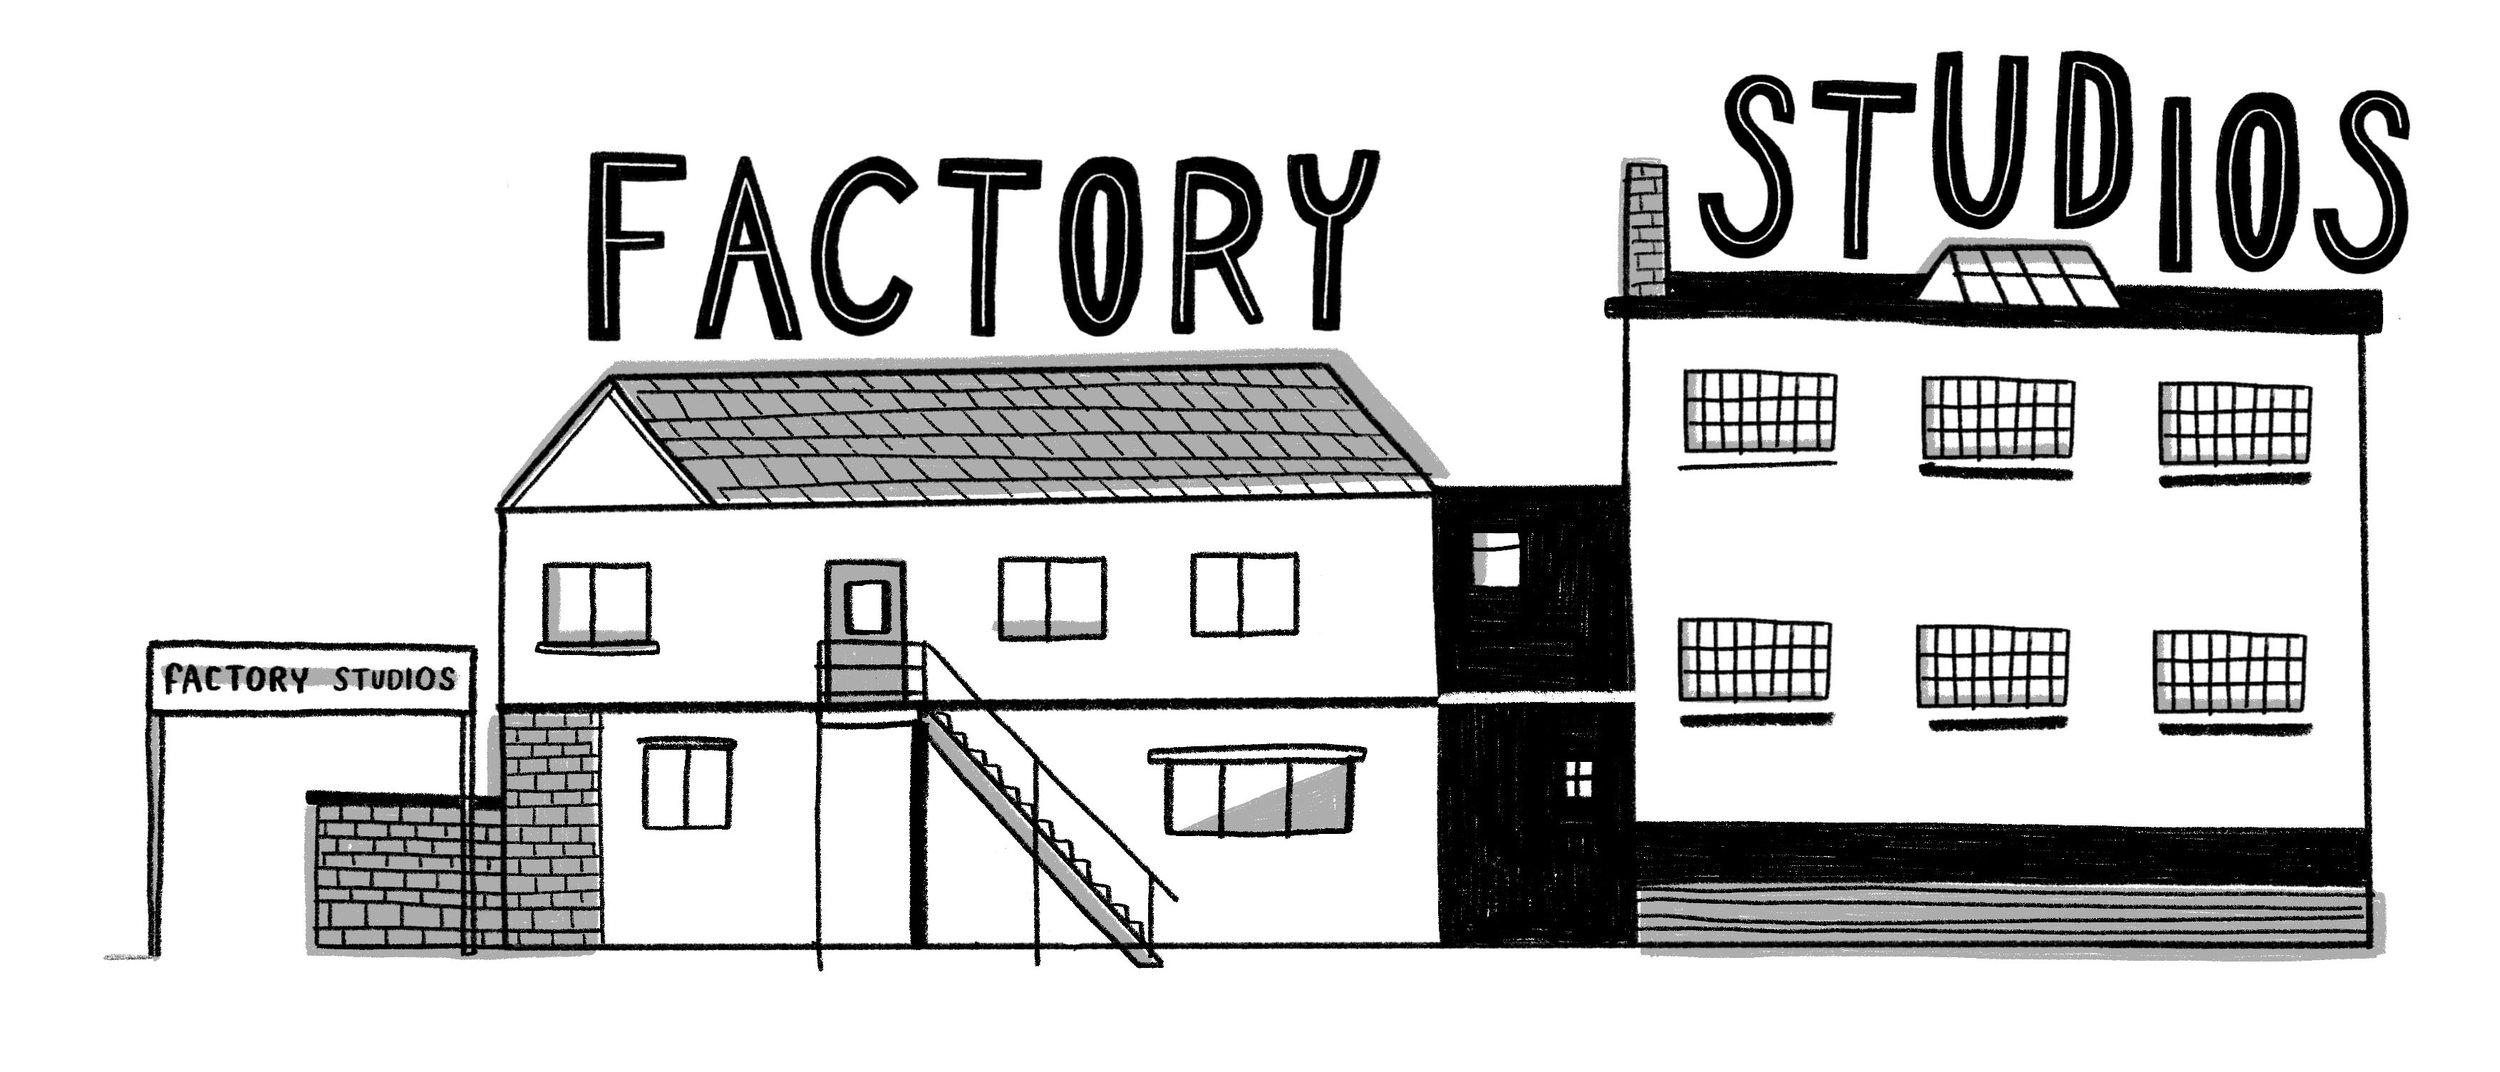 factorystudios2.jpg